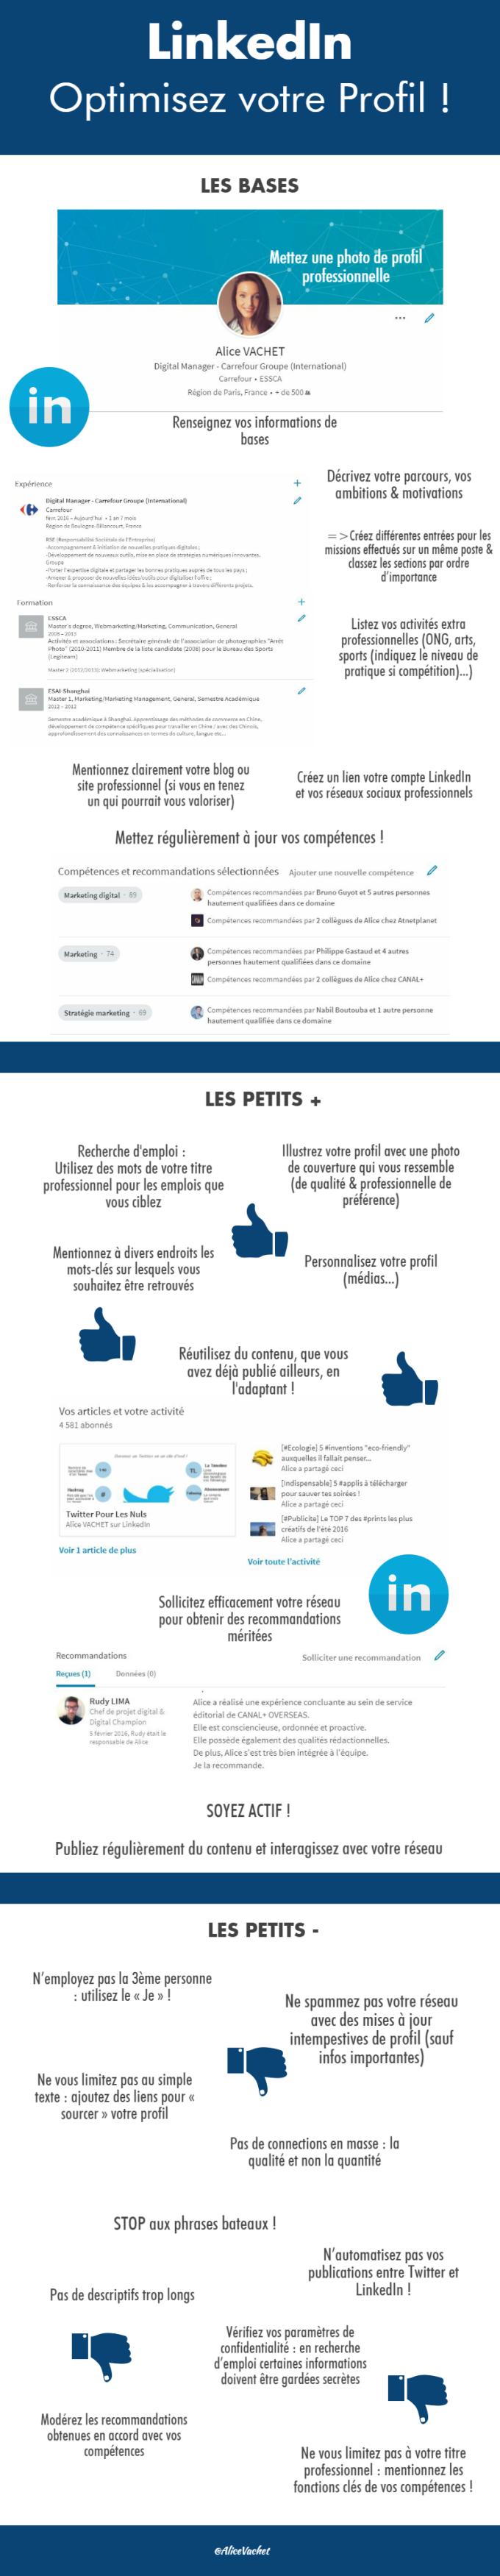 [INFOGRAPHIE] SOCIAL MEDIA : Optimisez Votre Profil LinkedIn!